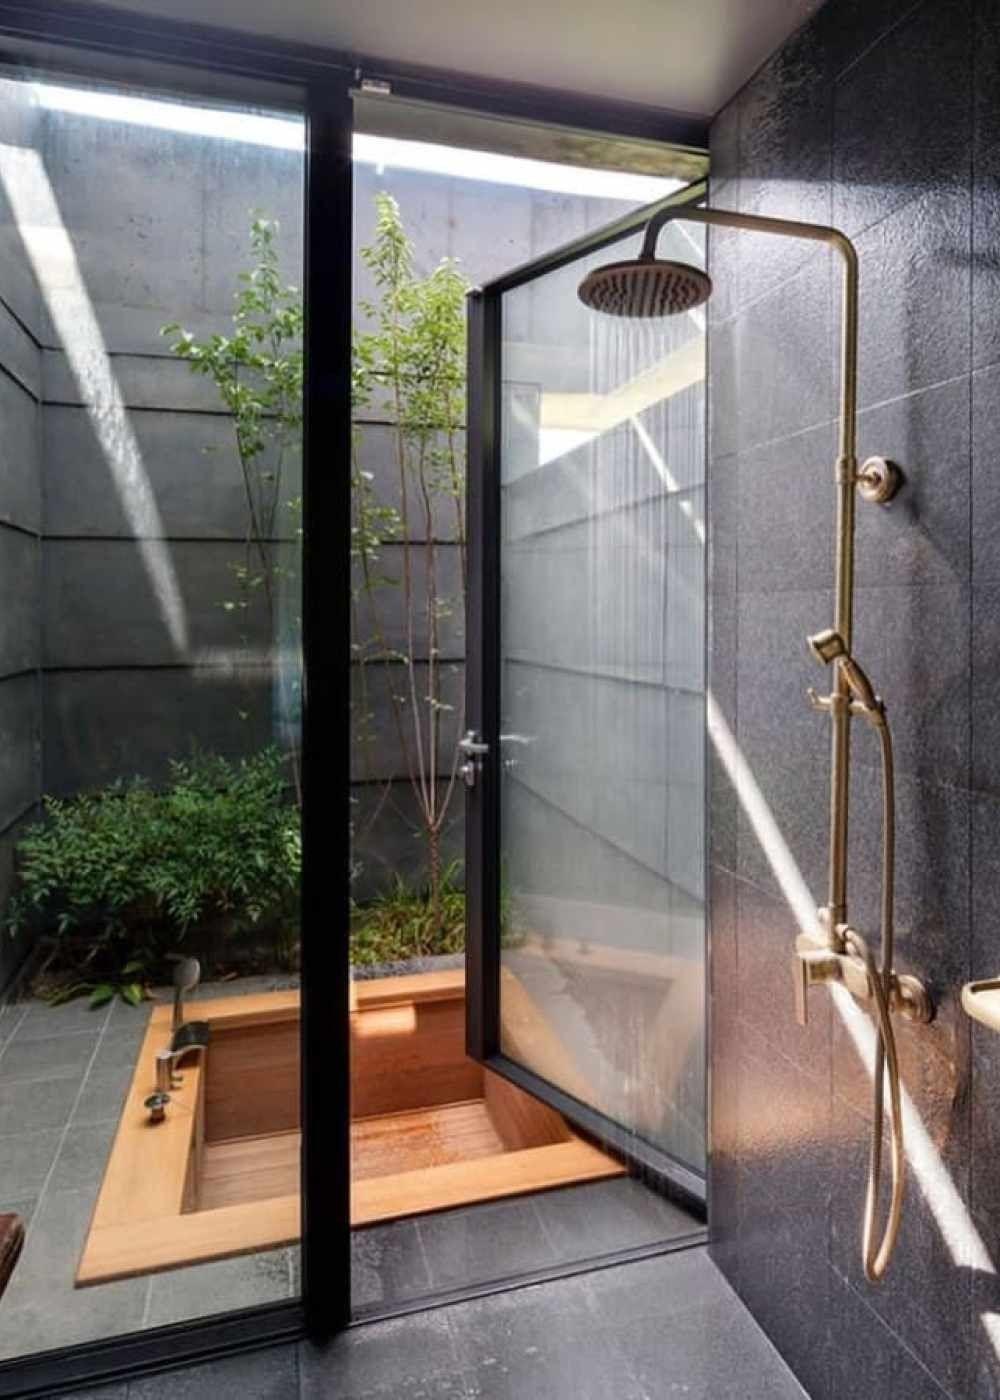 Green Bathroom Ideas How To Create An Eco Friendly Bathroom In 2020 Outdoor Bathroom Design Indoor Outdoor Bathroom Outdoor Bathrooms